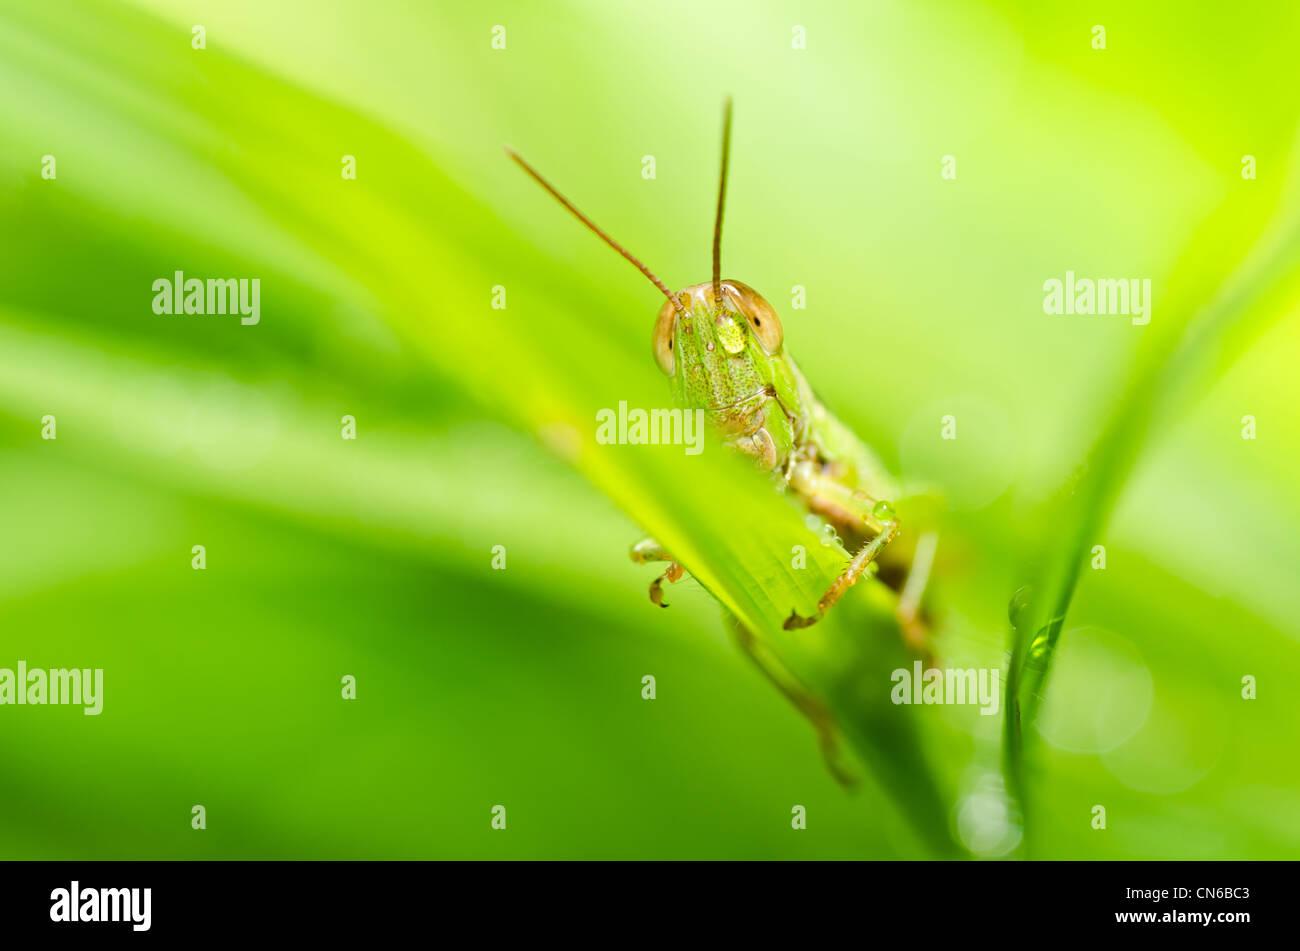 Heuschrecke in der grünen Natur oder im Garten Stockbild